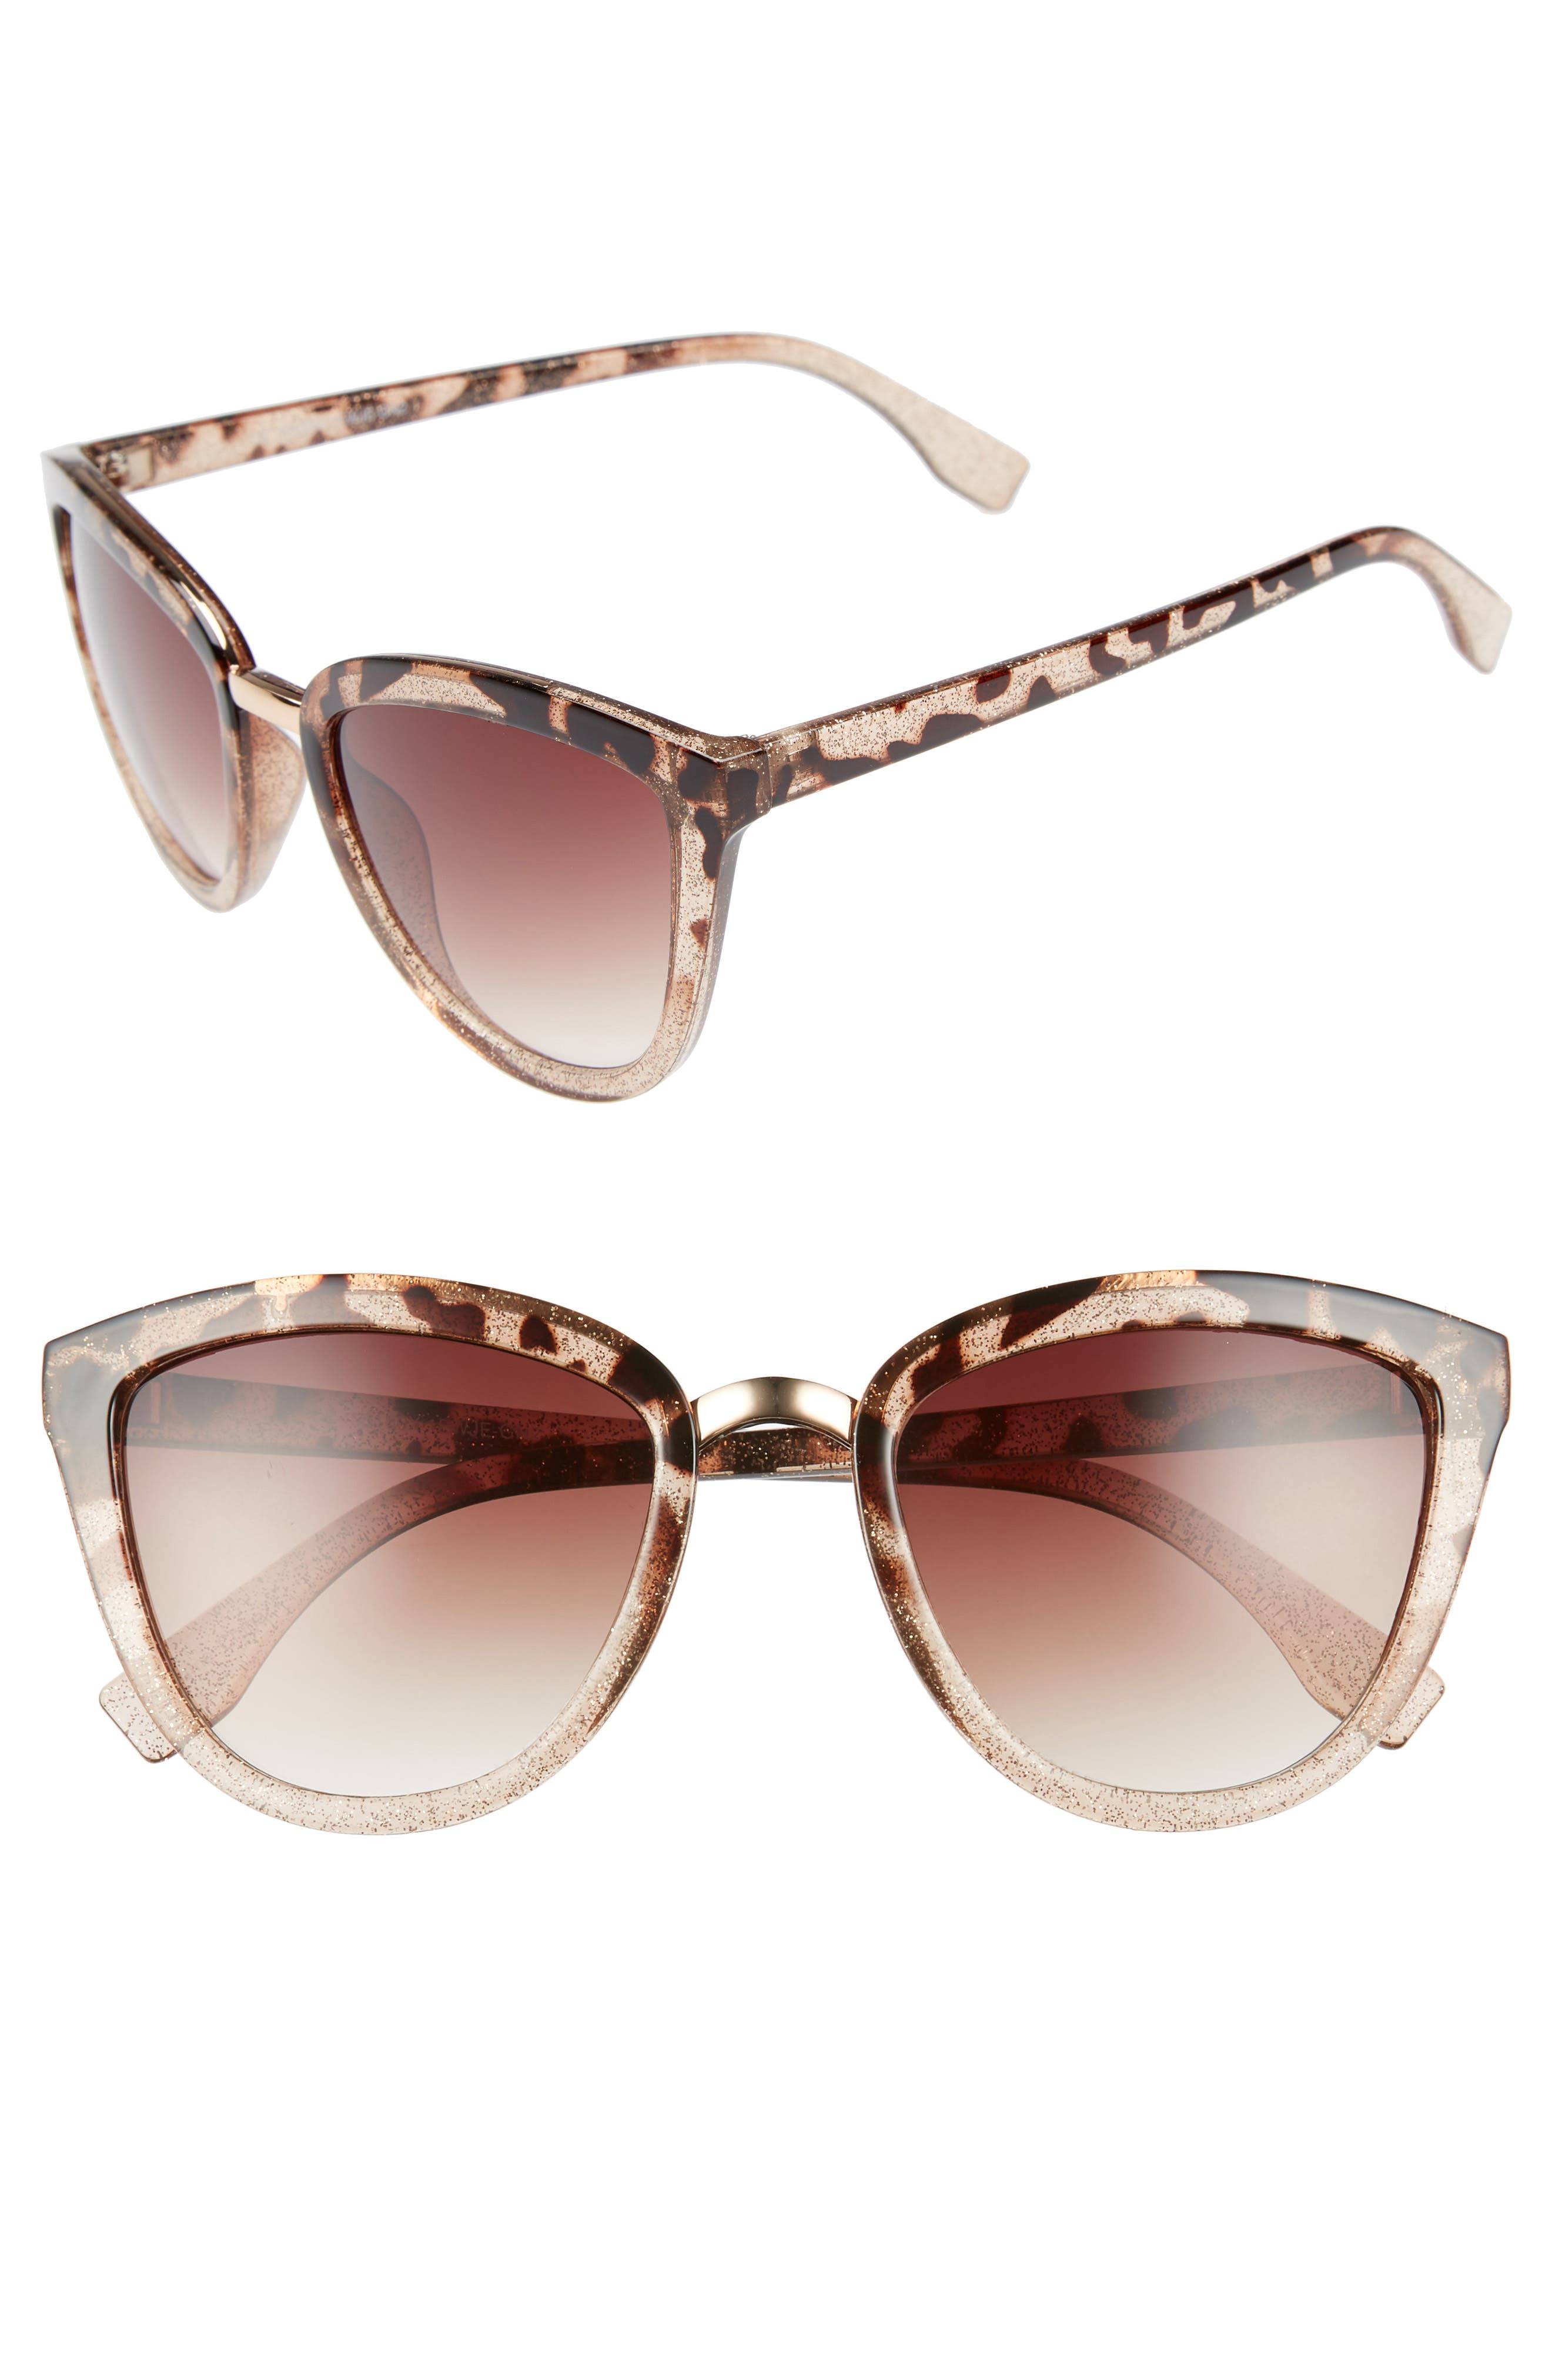 54mm Sparkle Cat Eye Sunglasses,                             Main thumbnail 1, color,                             200